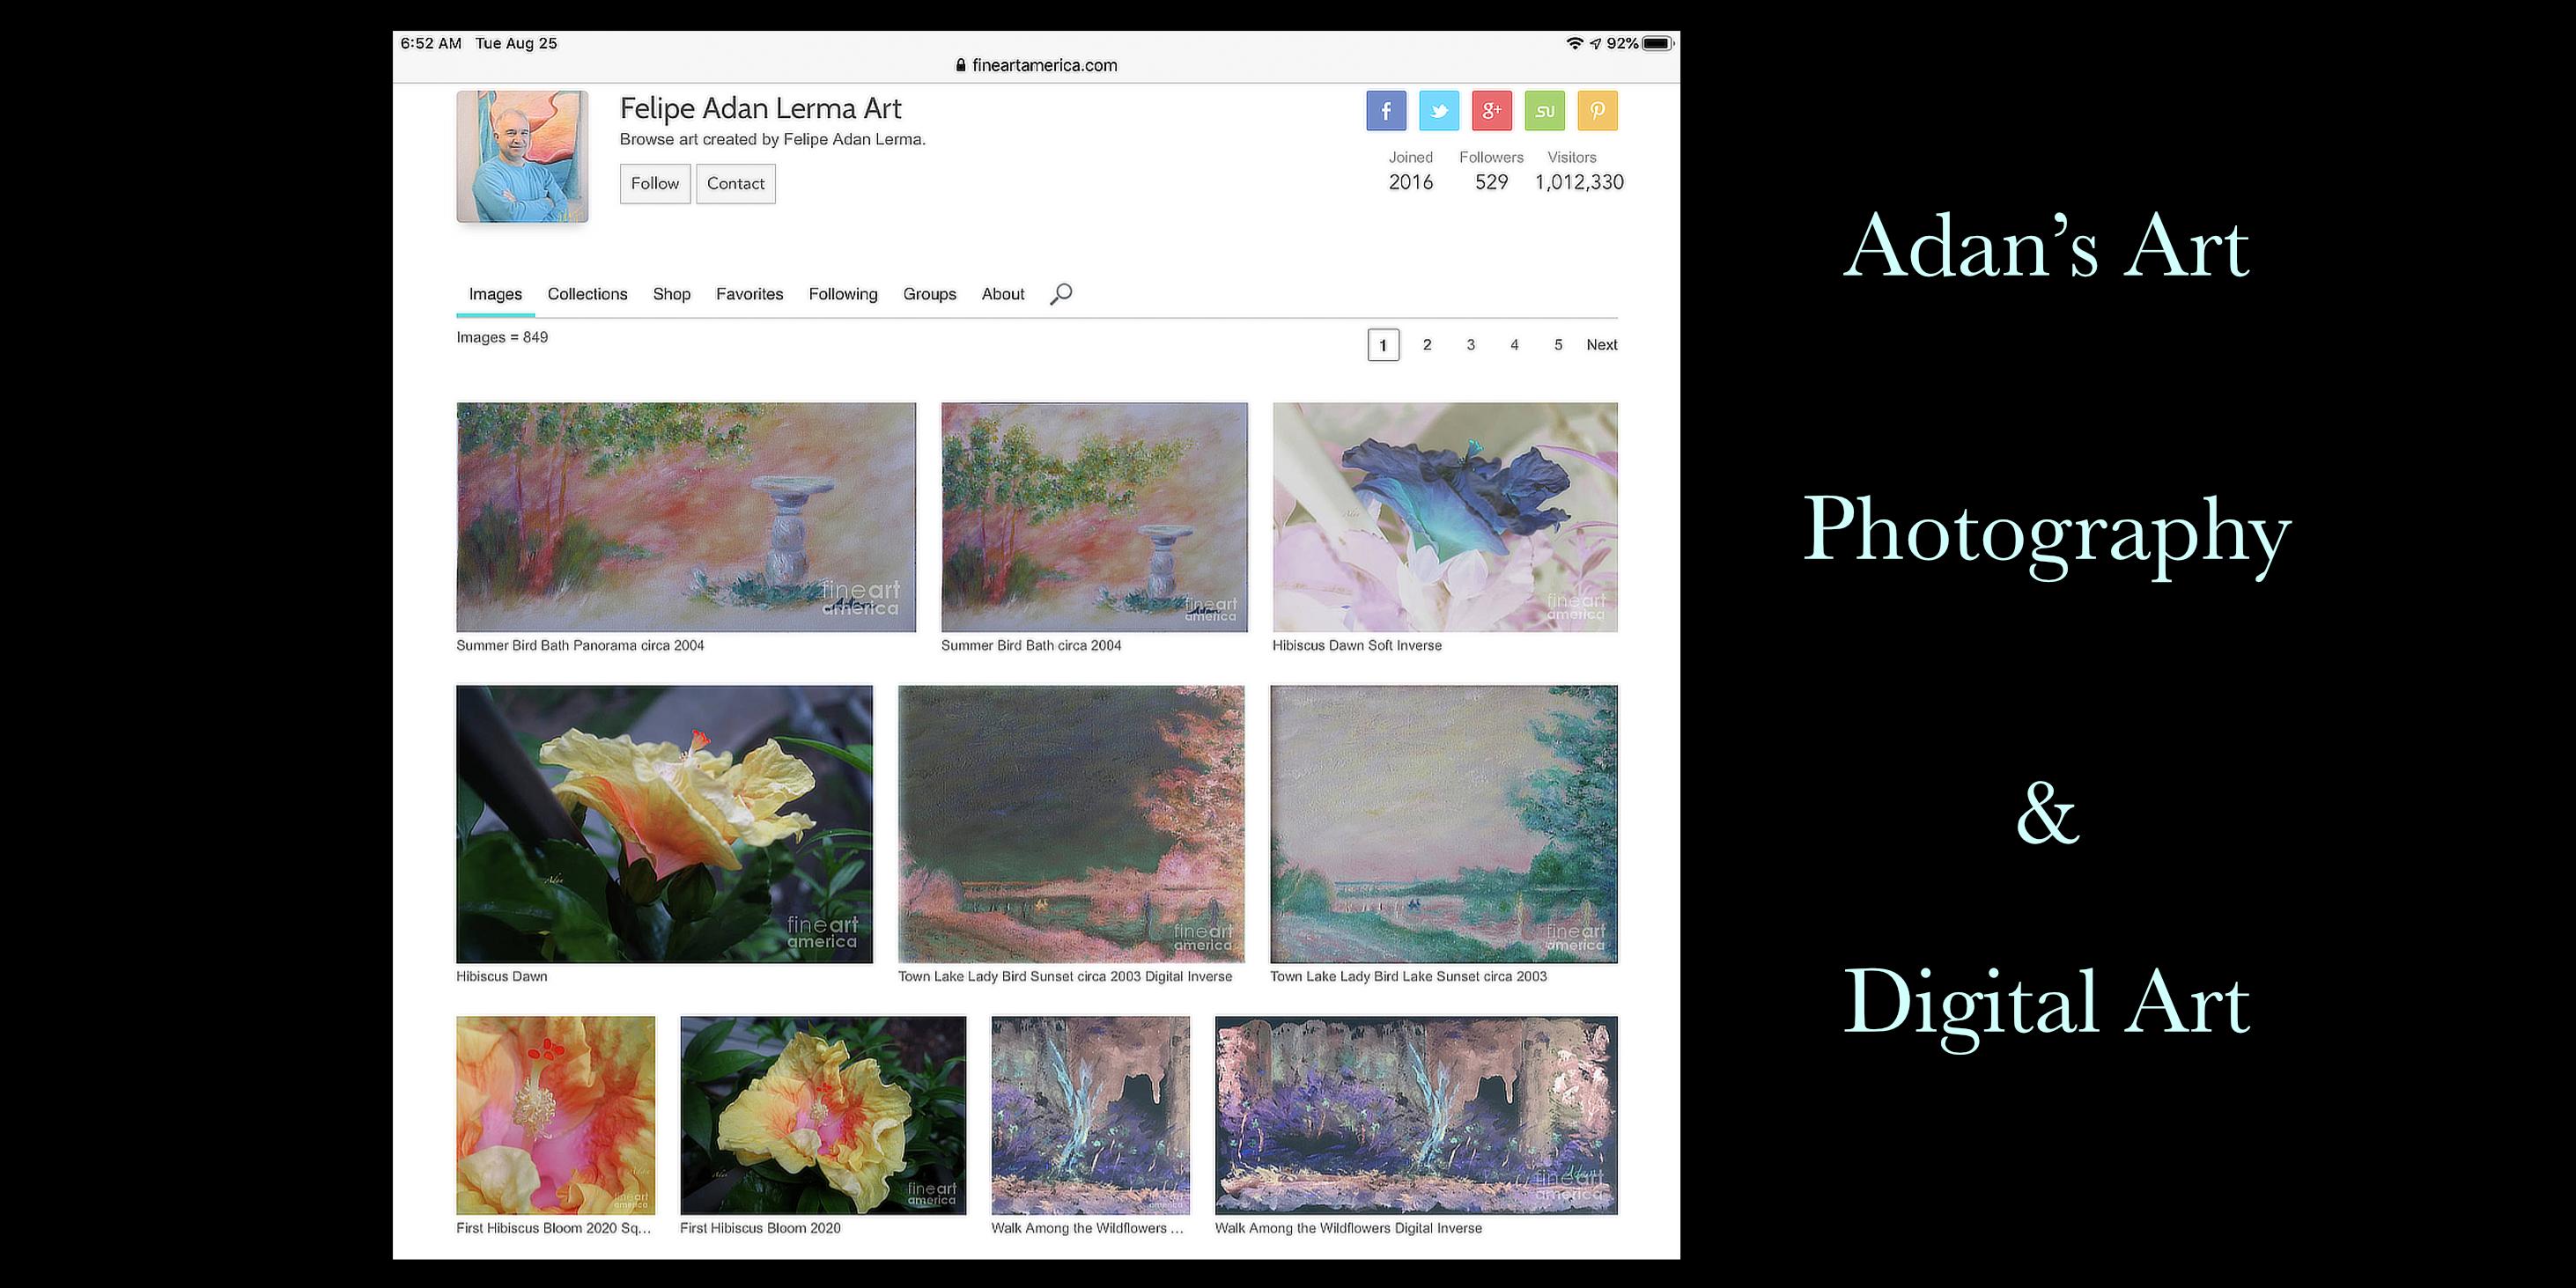 Sample Paintings by Felipe Adan Lerma on Fine Art America 08.25.20 https://fineartamerica.com/profiles/felipeadan-lerma?tab=artworkgalleries&artworkgalleryid=702859